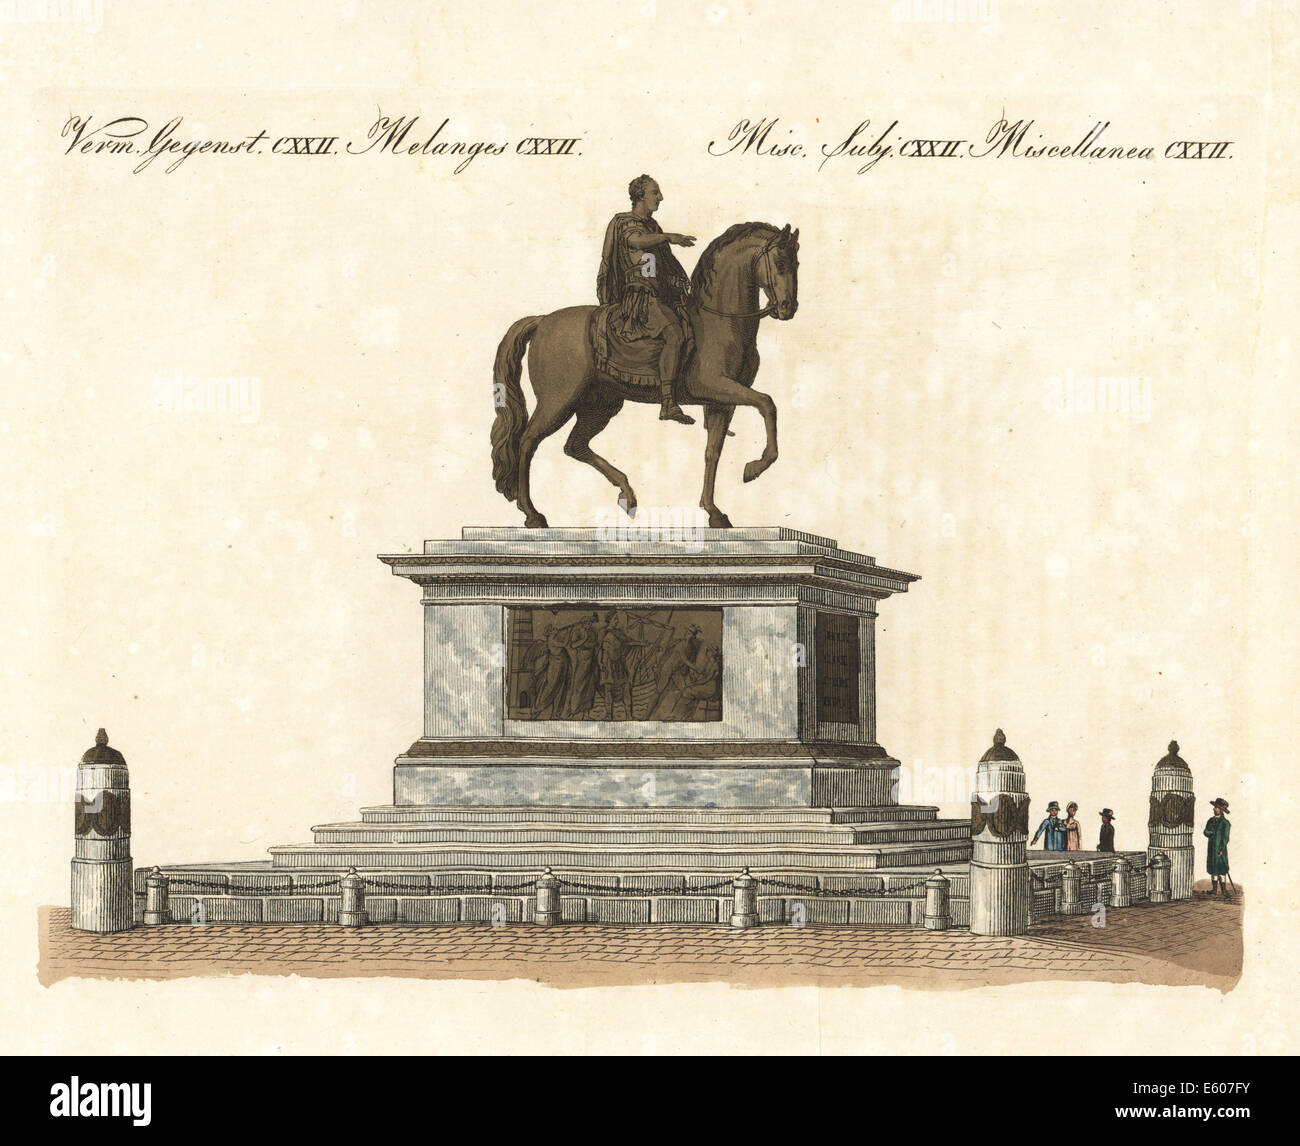 Equestrian statue of the Emperor Joseph II, Vienna, 18th century. - Stock Image